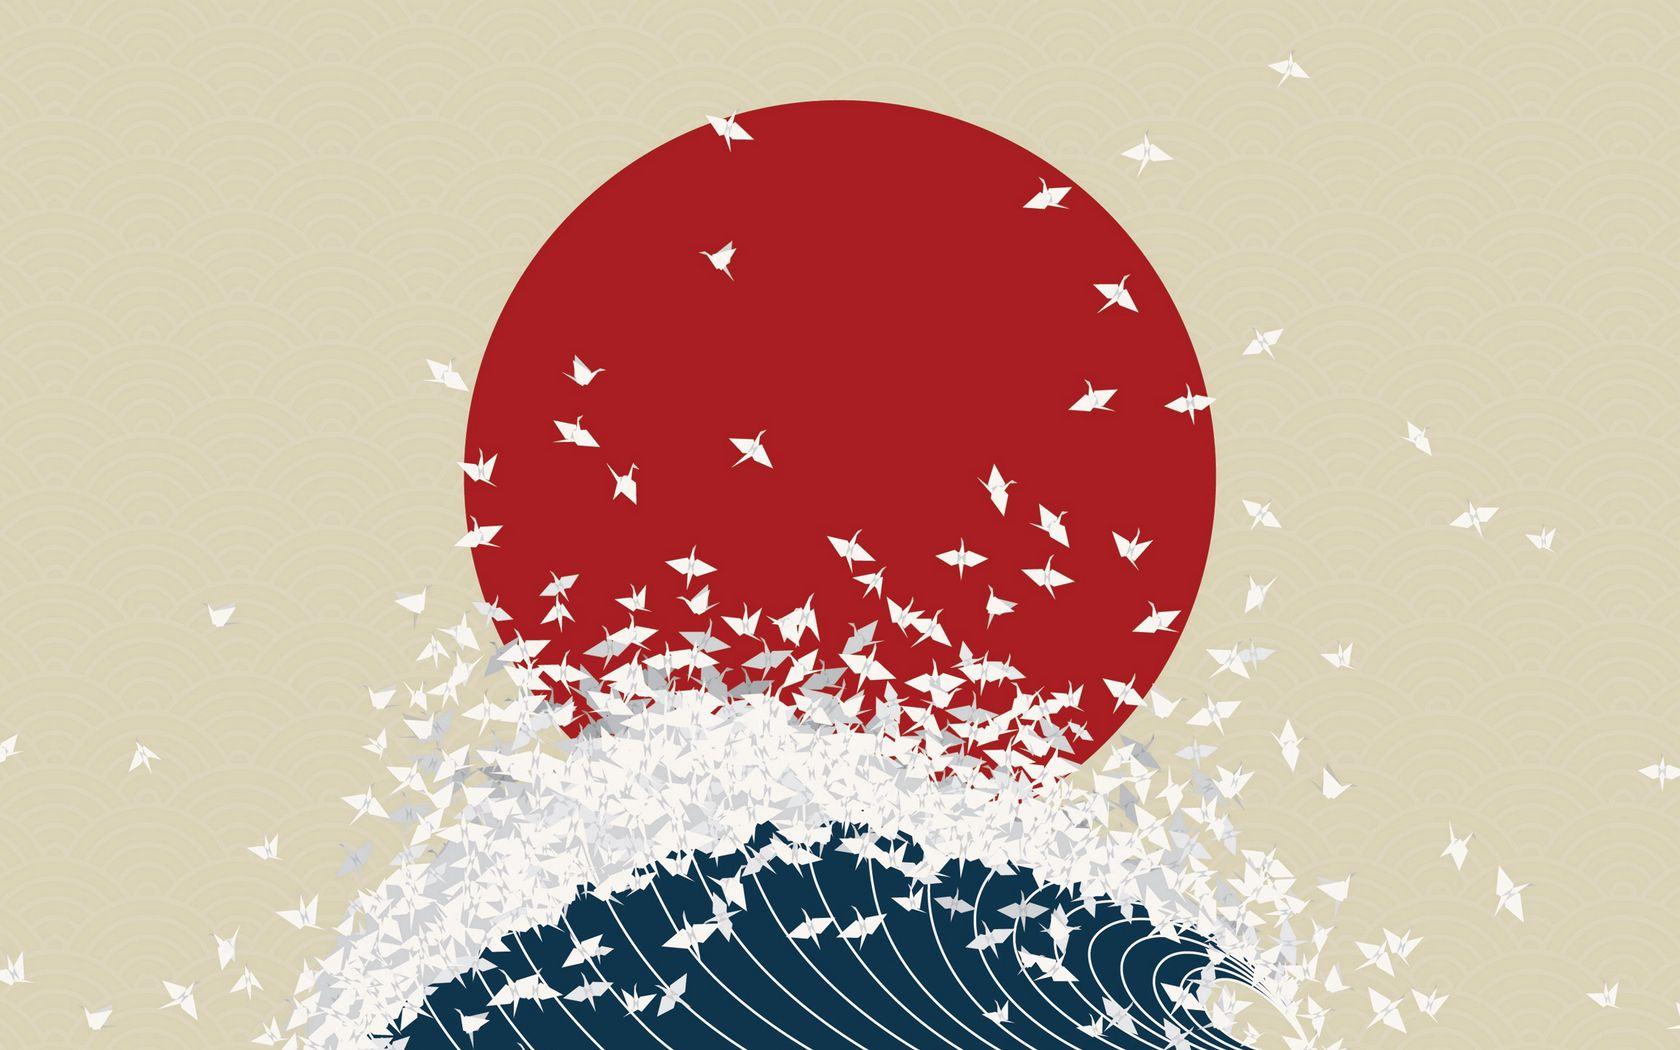 1680x1050 Wallpaper minimalism, origami, japan, rising sun, wave